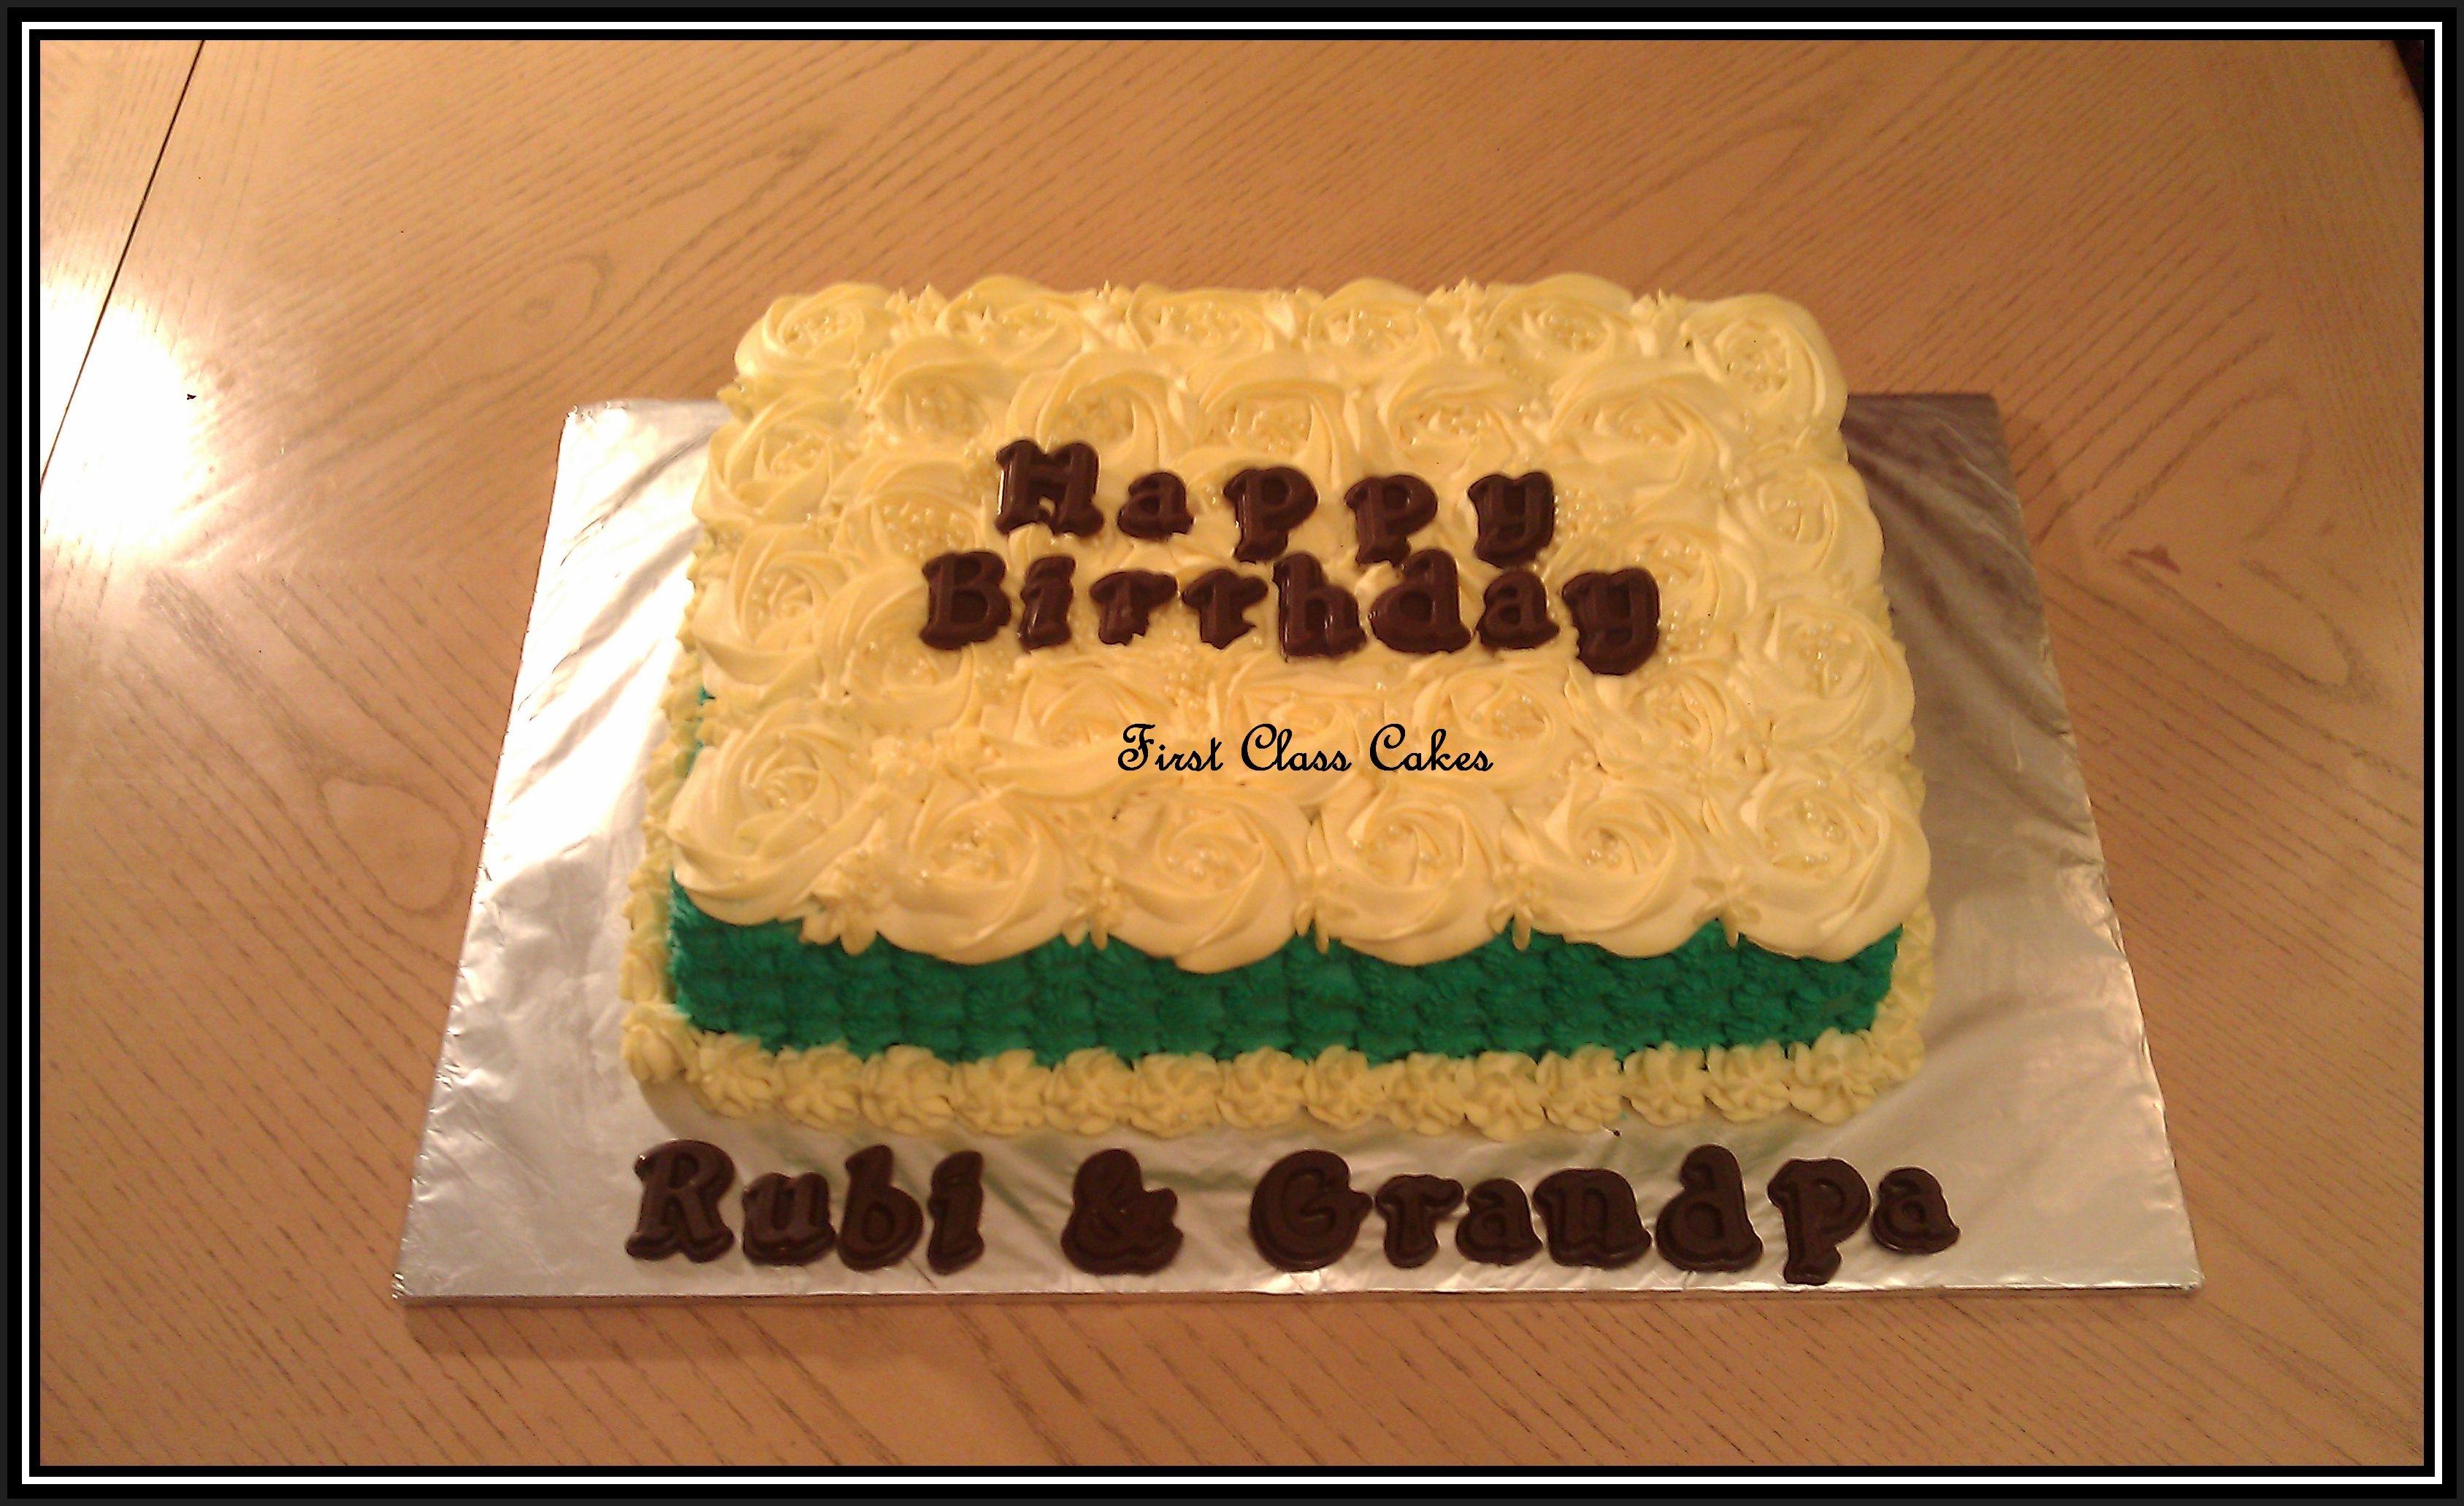 Rosette/petal Effect - Sheet Cake - CakeCentral.com